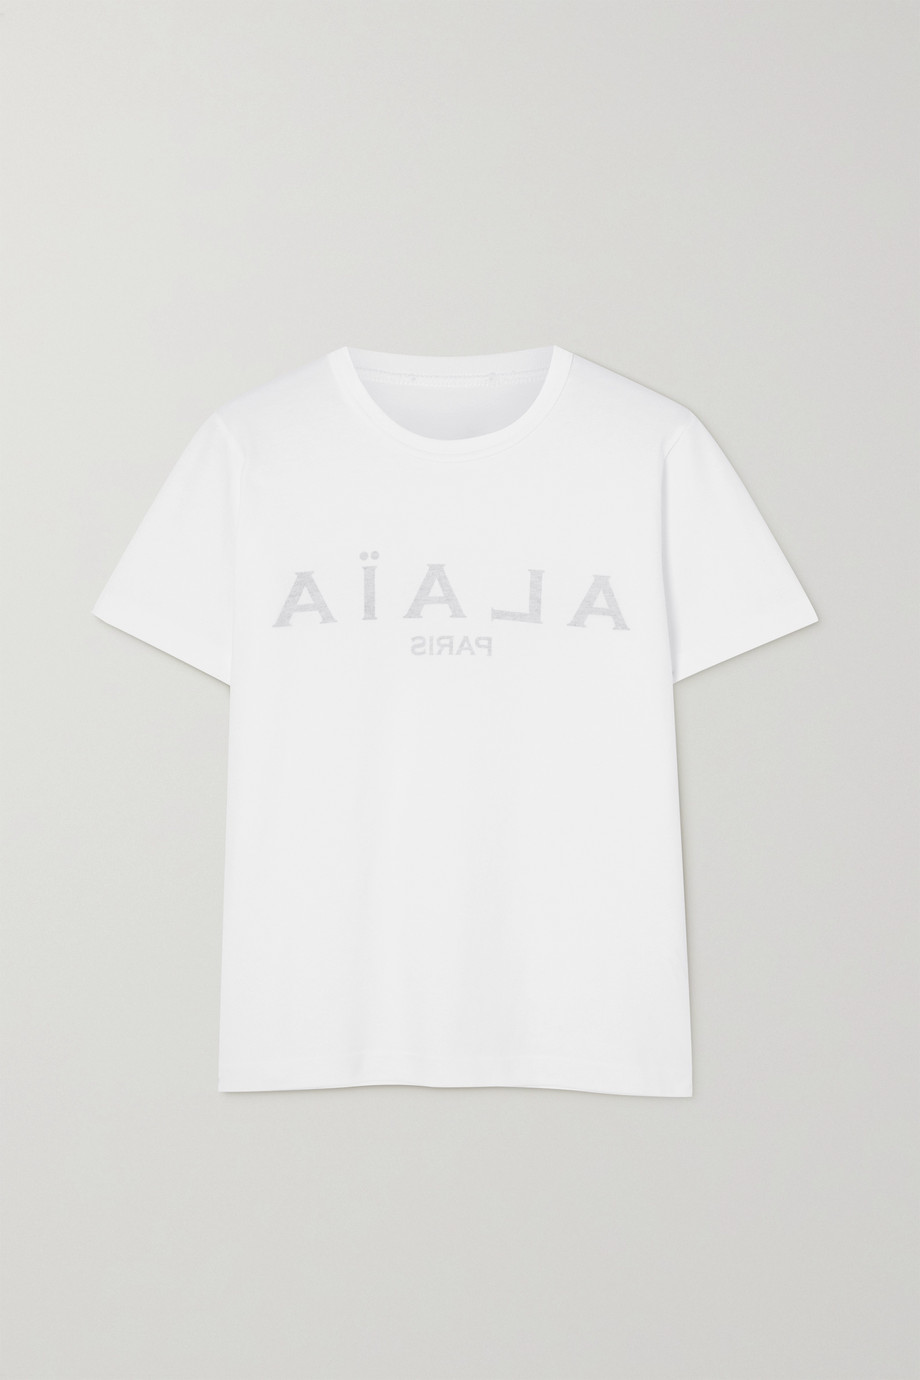 Alaïa Editions printed cotton-jersey T-shirt